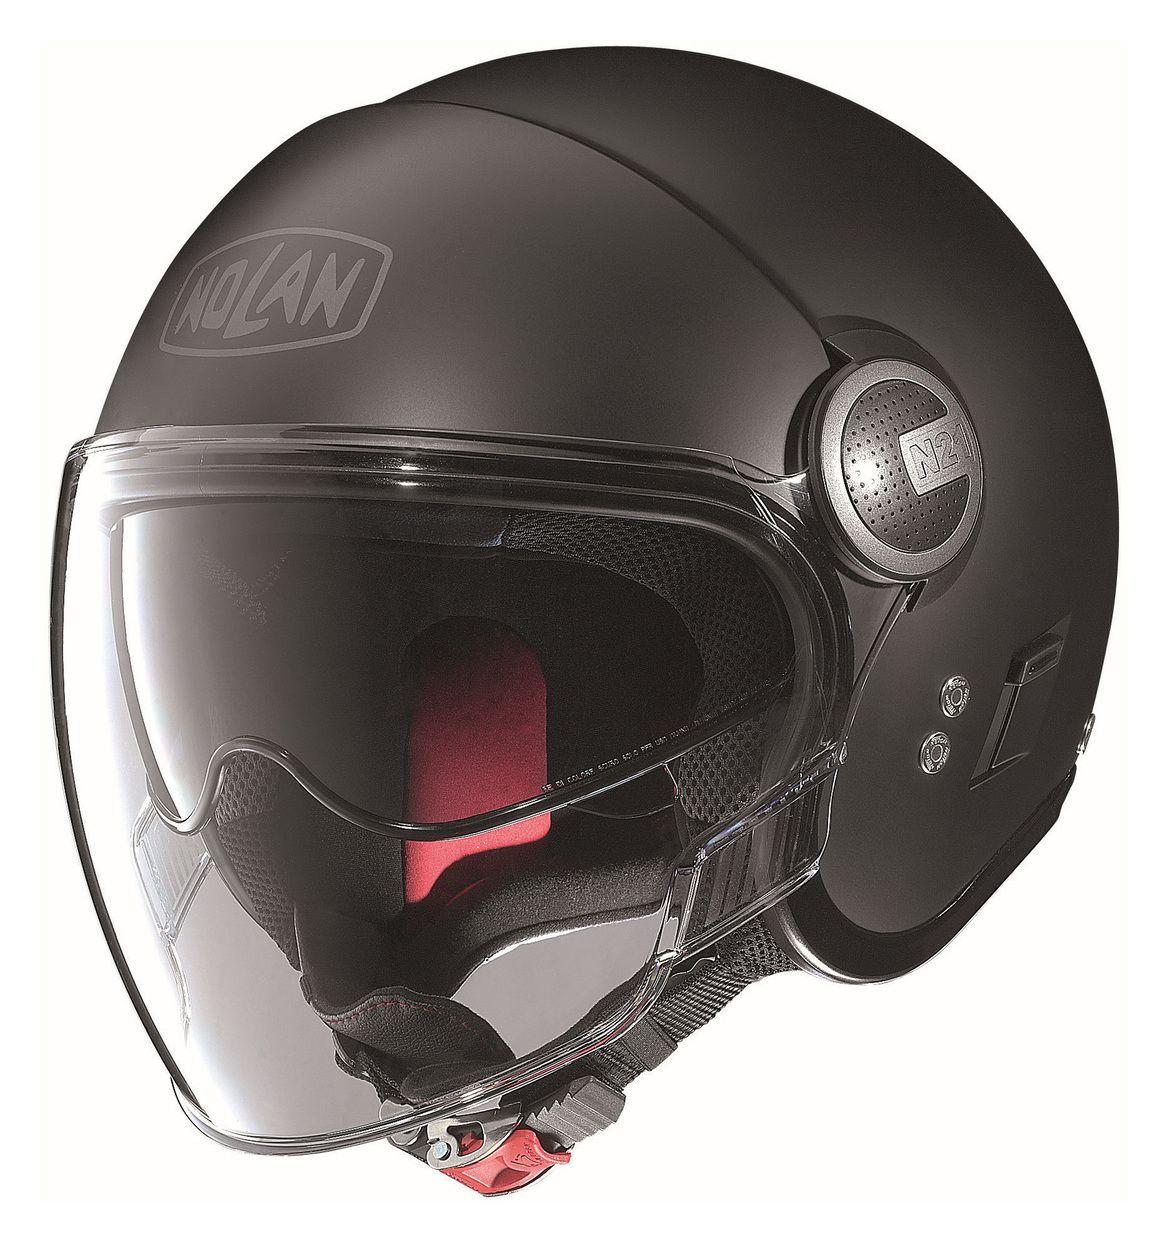 nolan n21 visor helmet solid revzilla. Black Bedroom Furniture Sets. Home Design Ideas